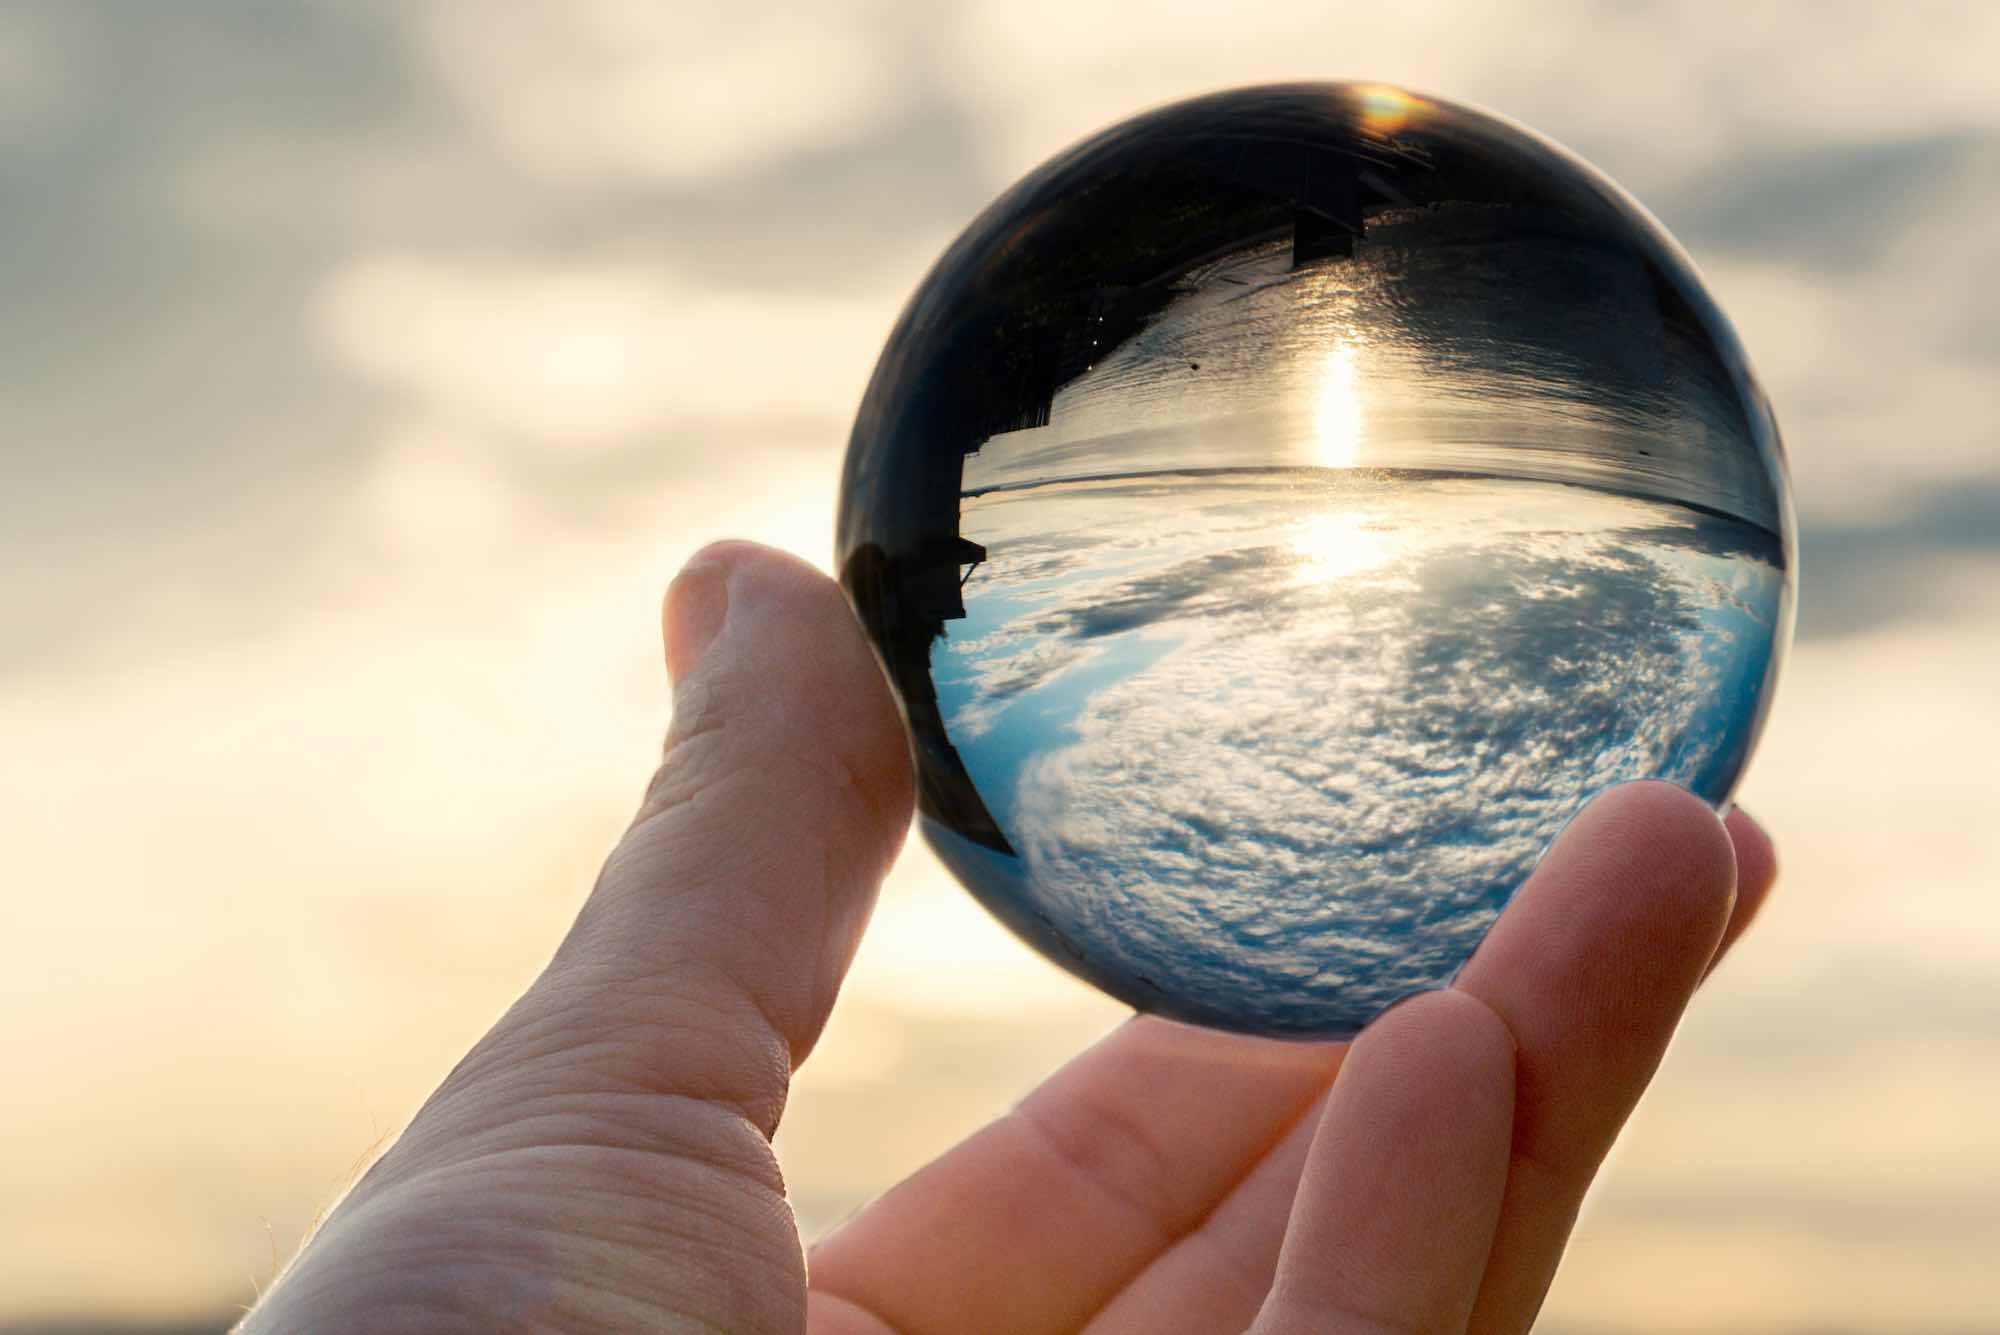 Lensball avec reflet de la mer et du soleil